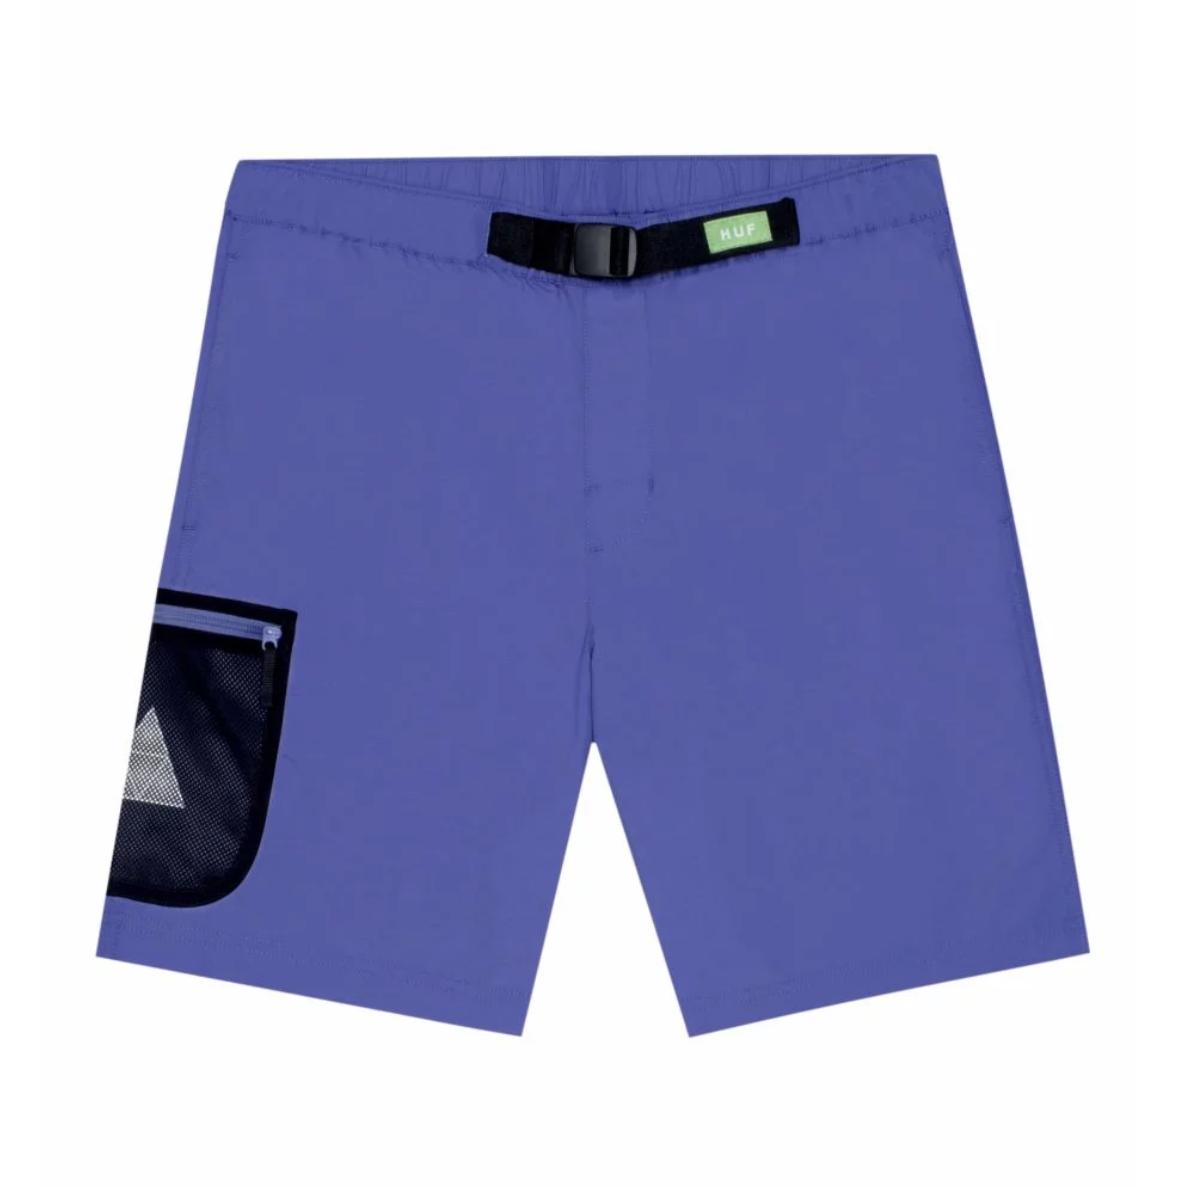 HUF Crosby Short Blue Iris